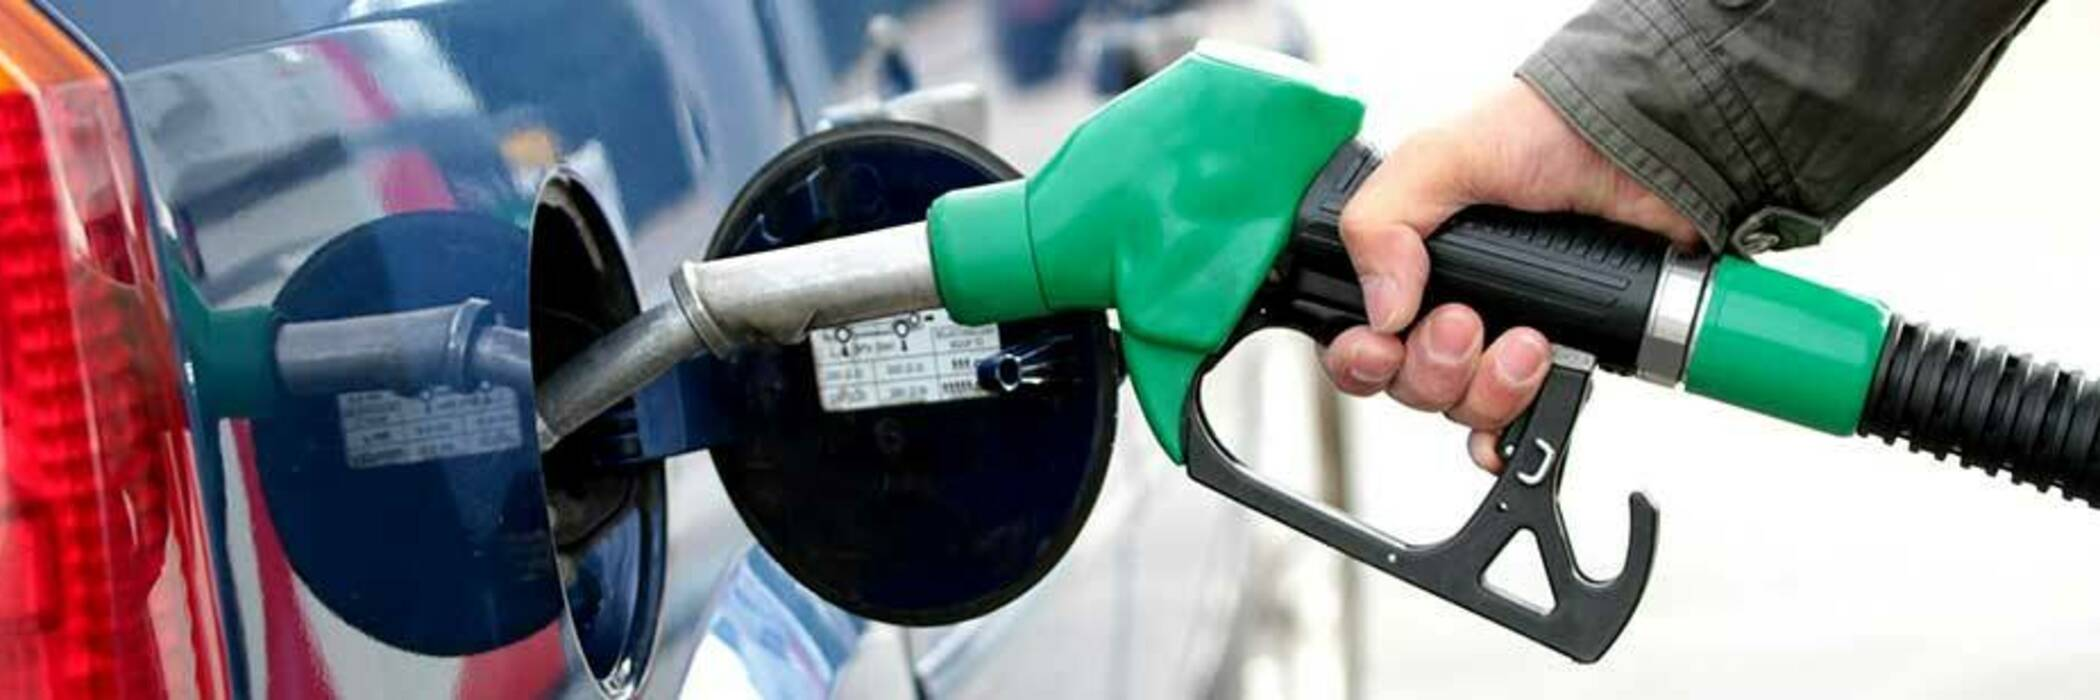 Pumping fuel into car.